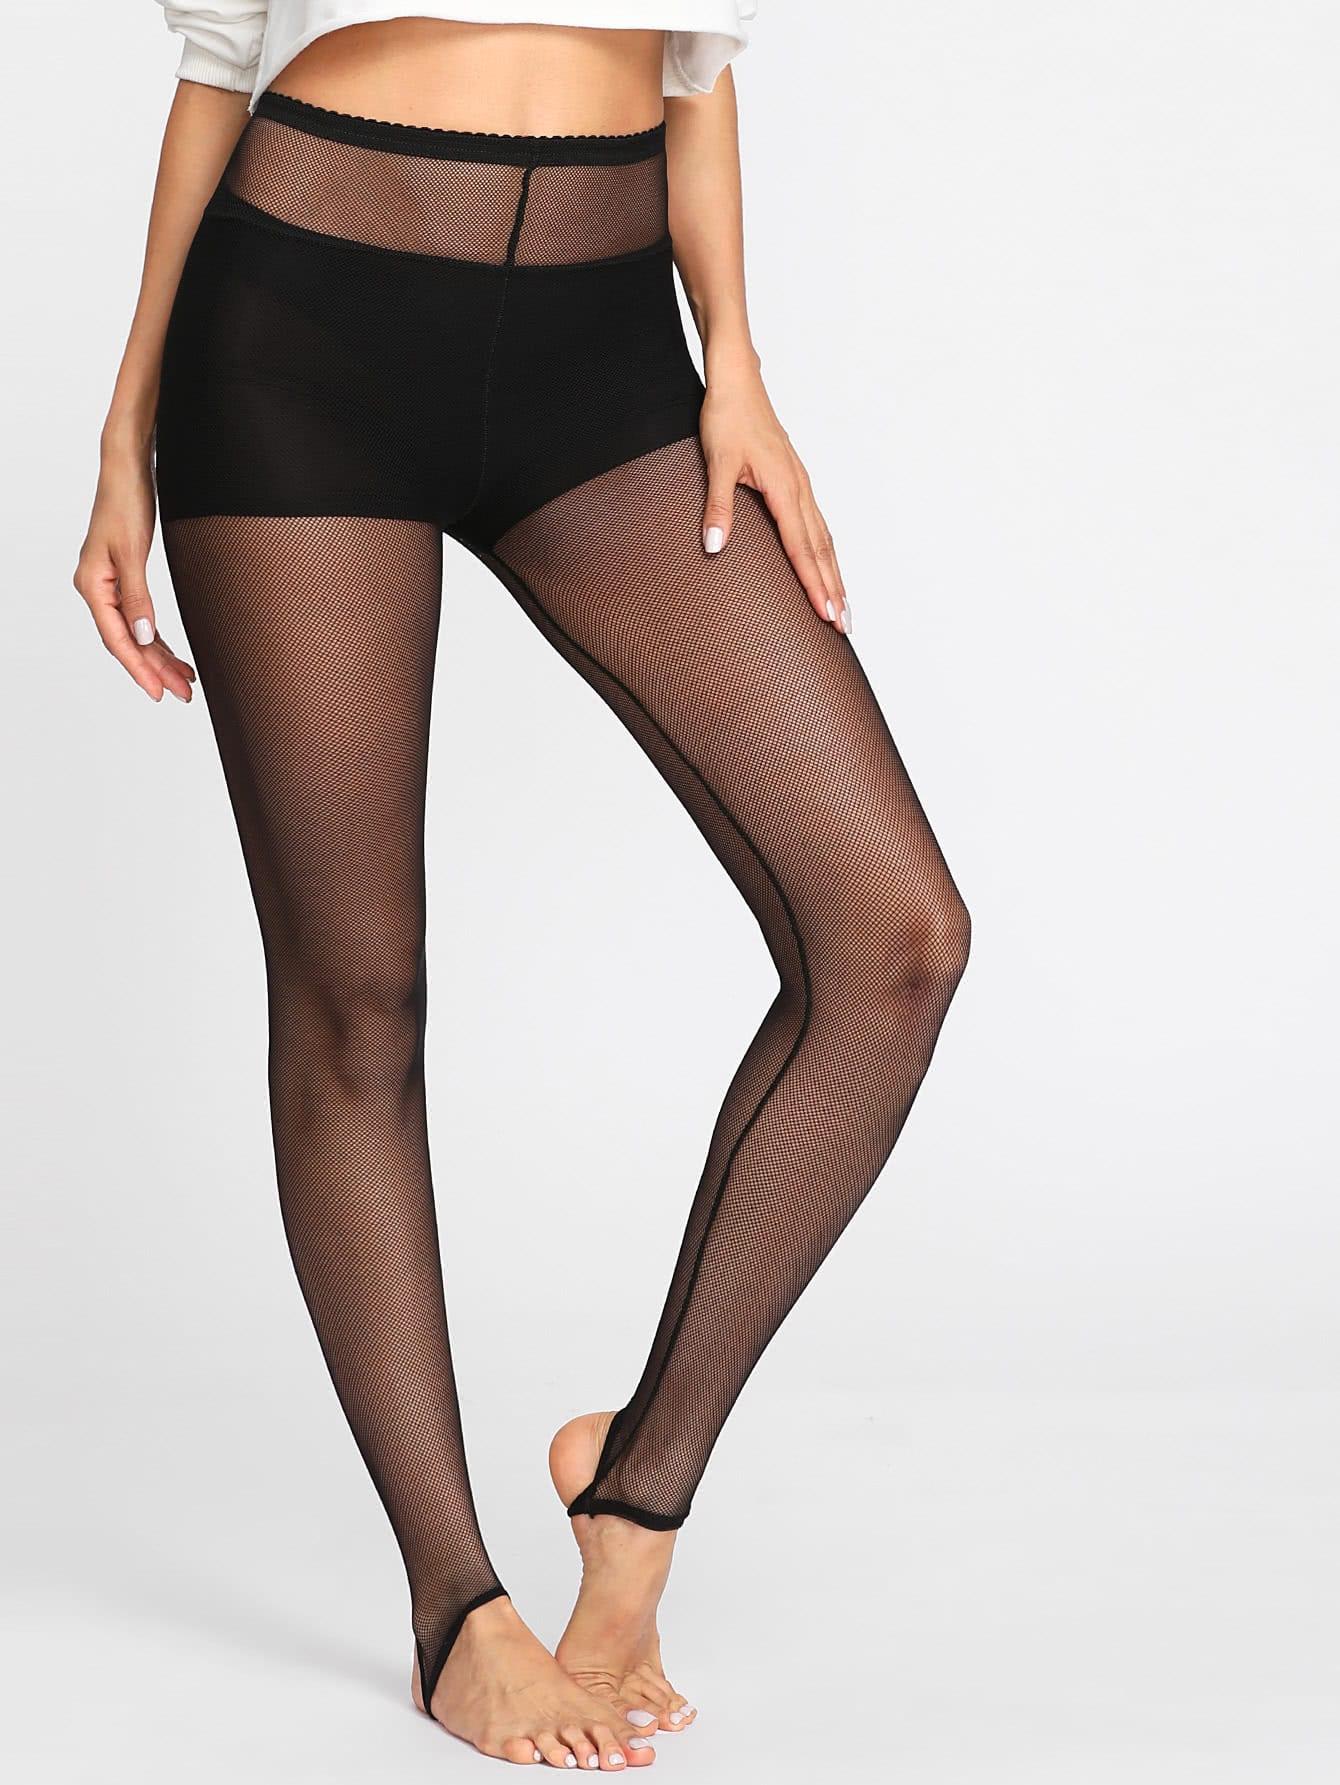 Stirrup Mesh Leggings stirrup mesh leggings